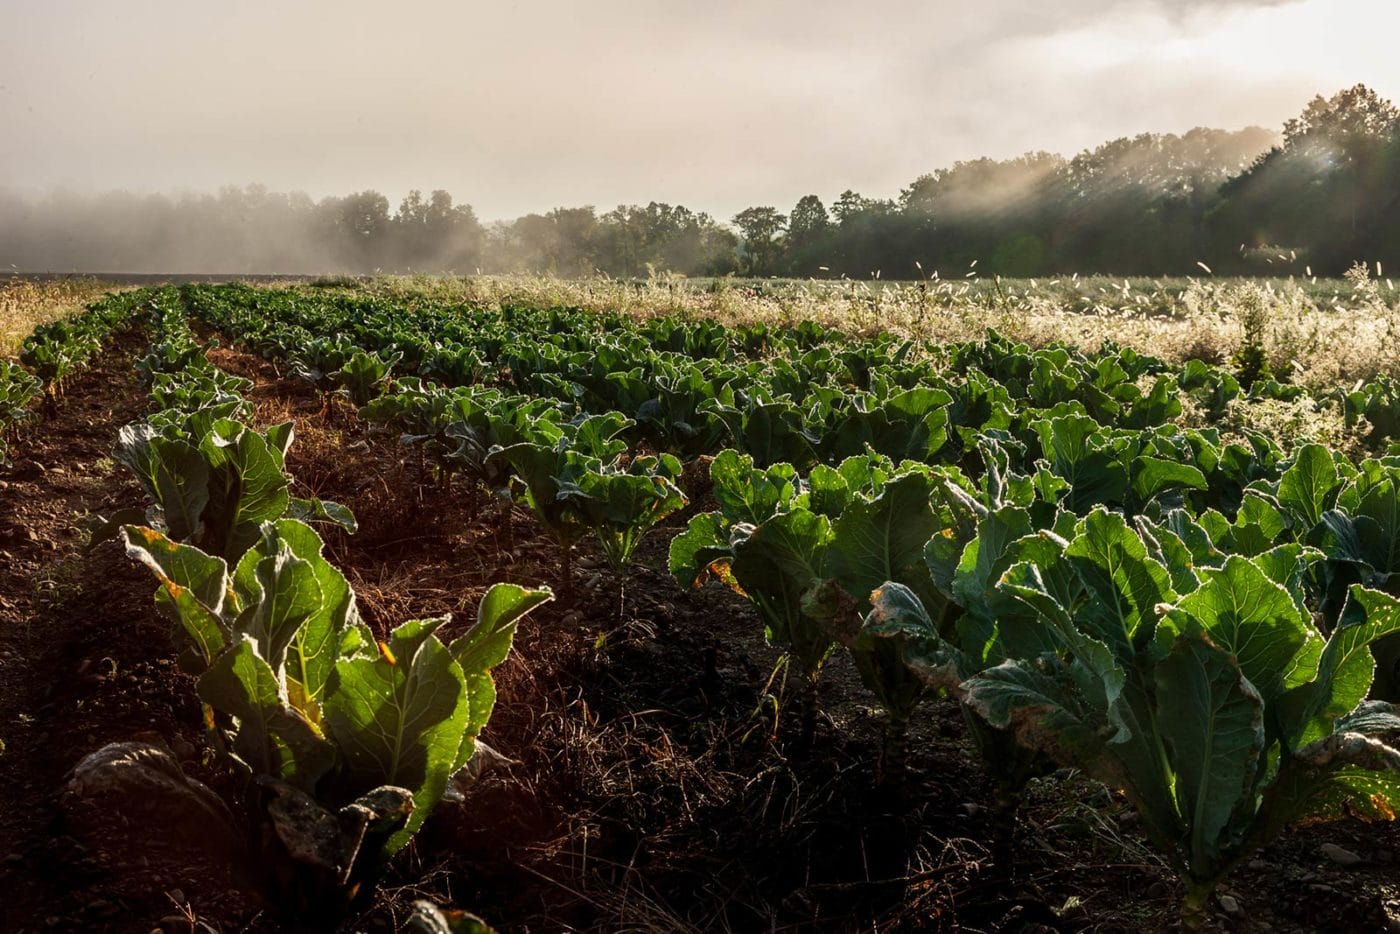 Crops at Millers Crossing